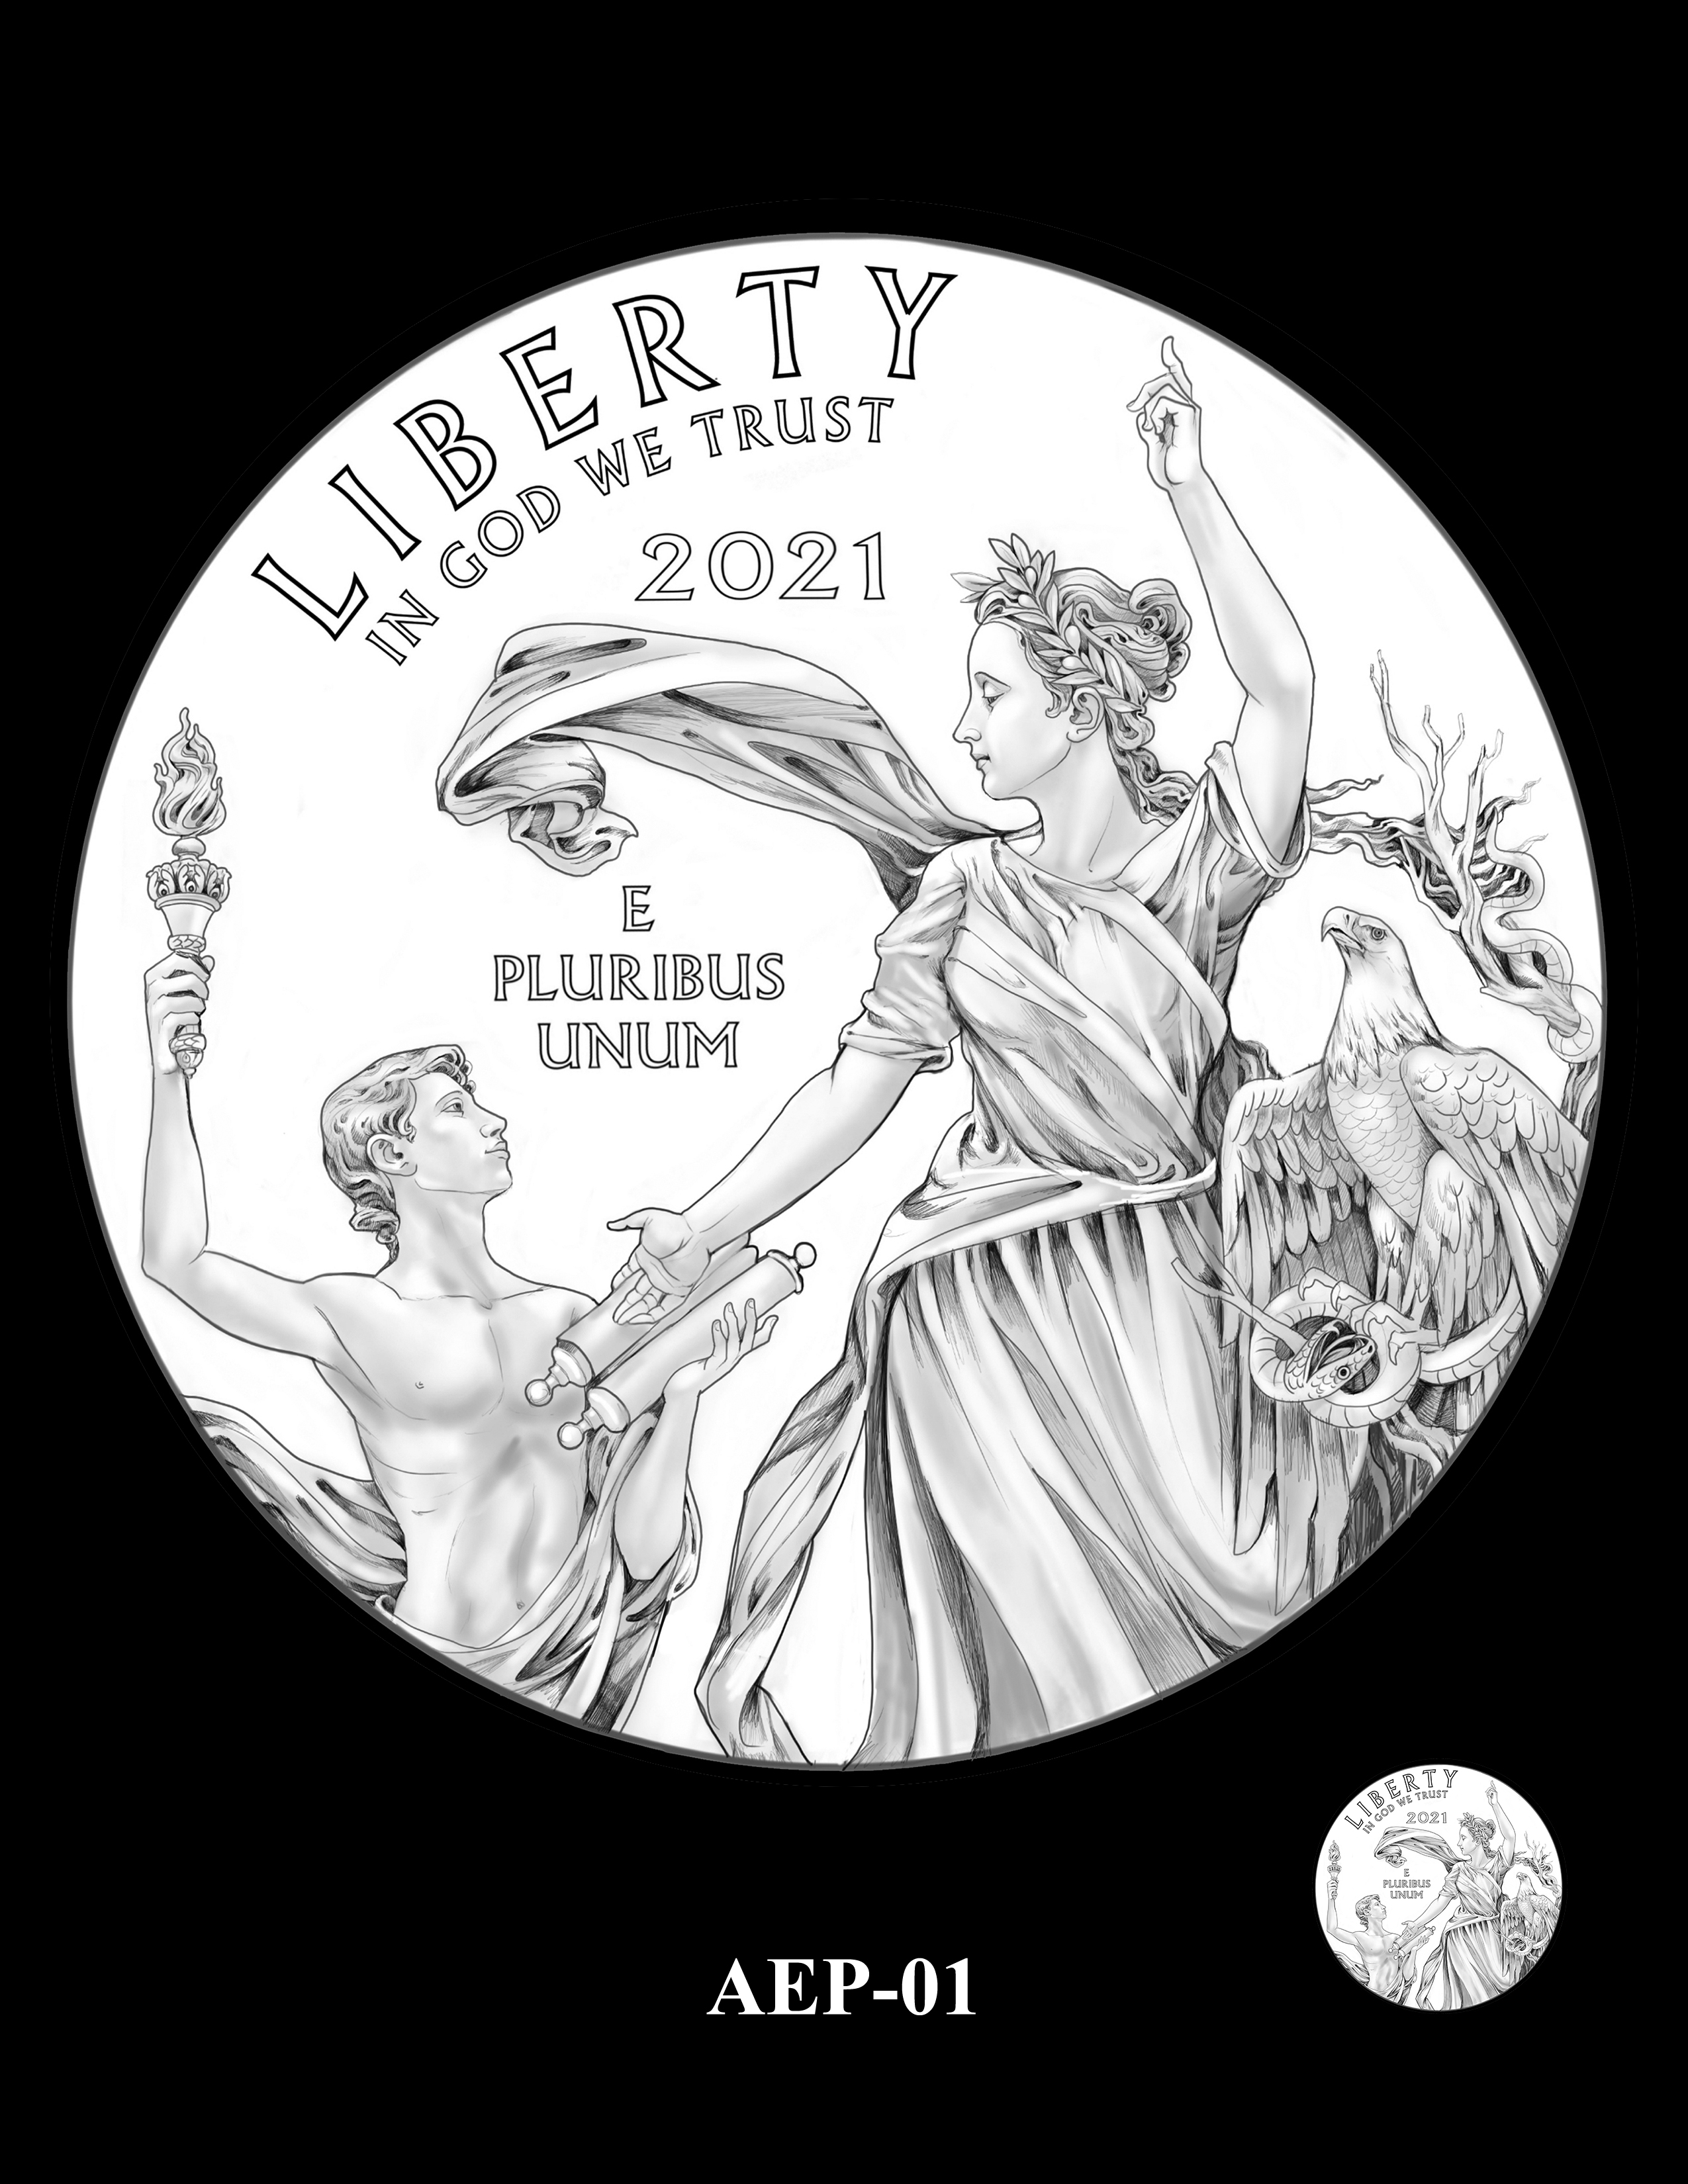 AEP-01 -- 2021 American Eagle Platinum Proof Program